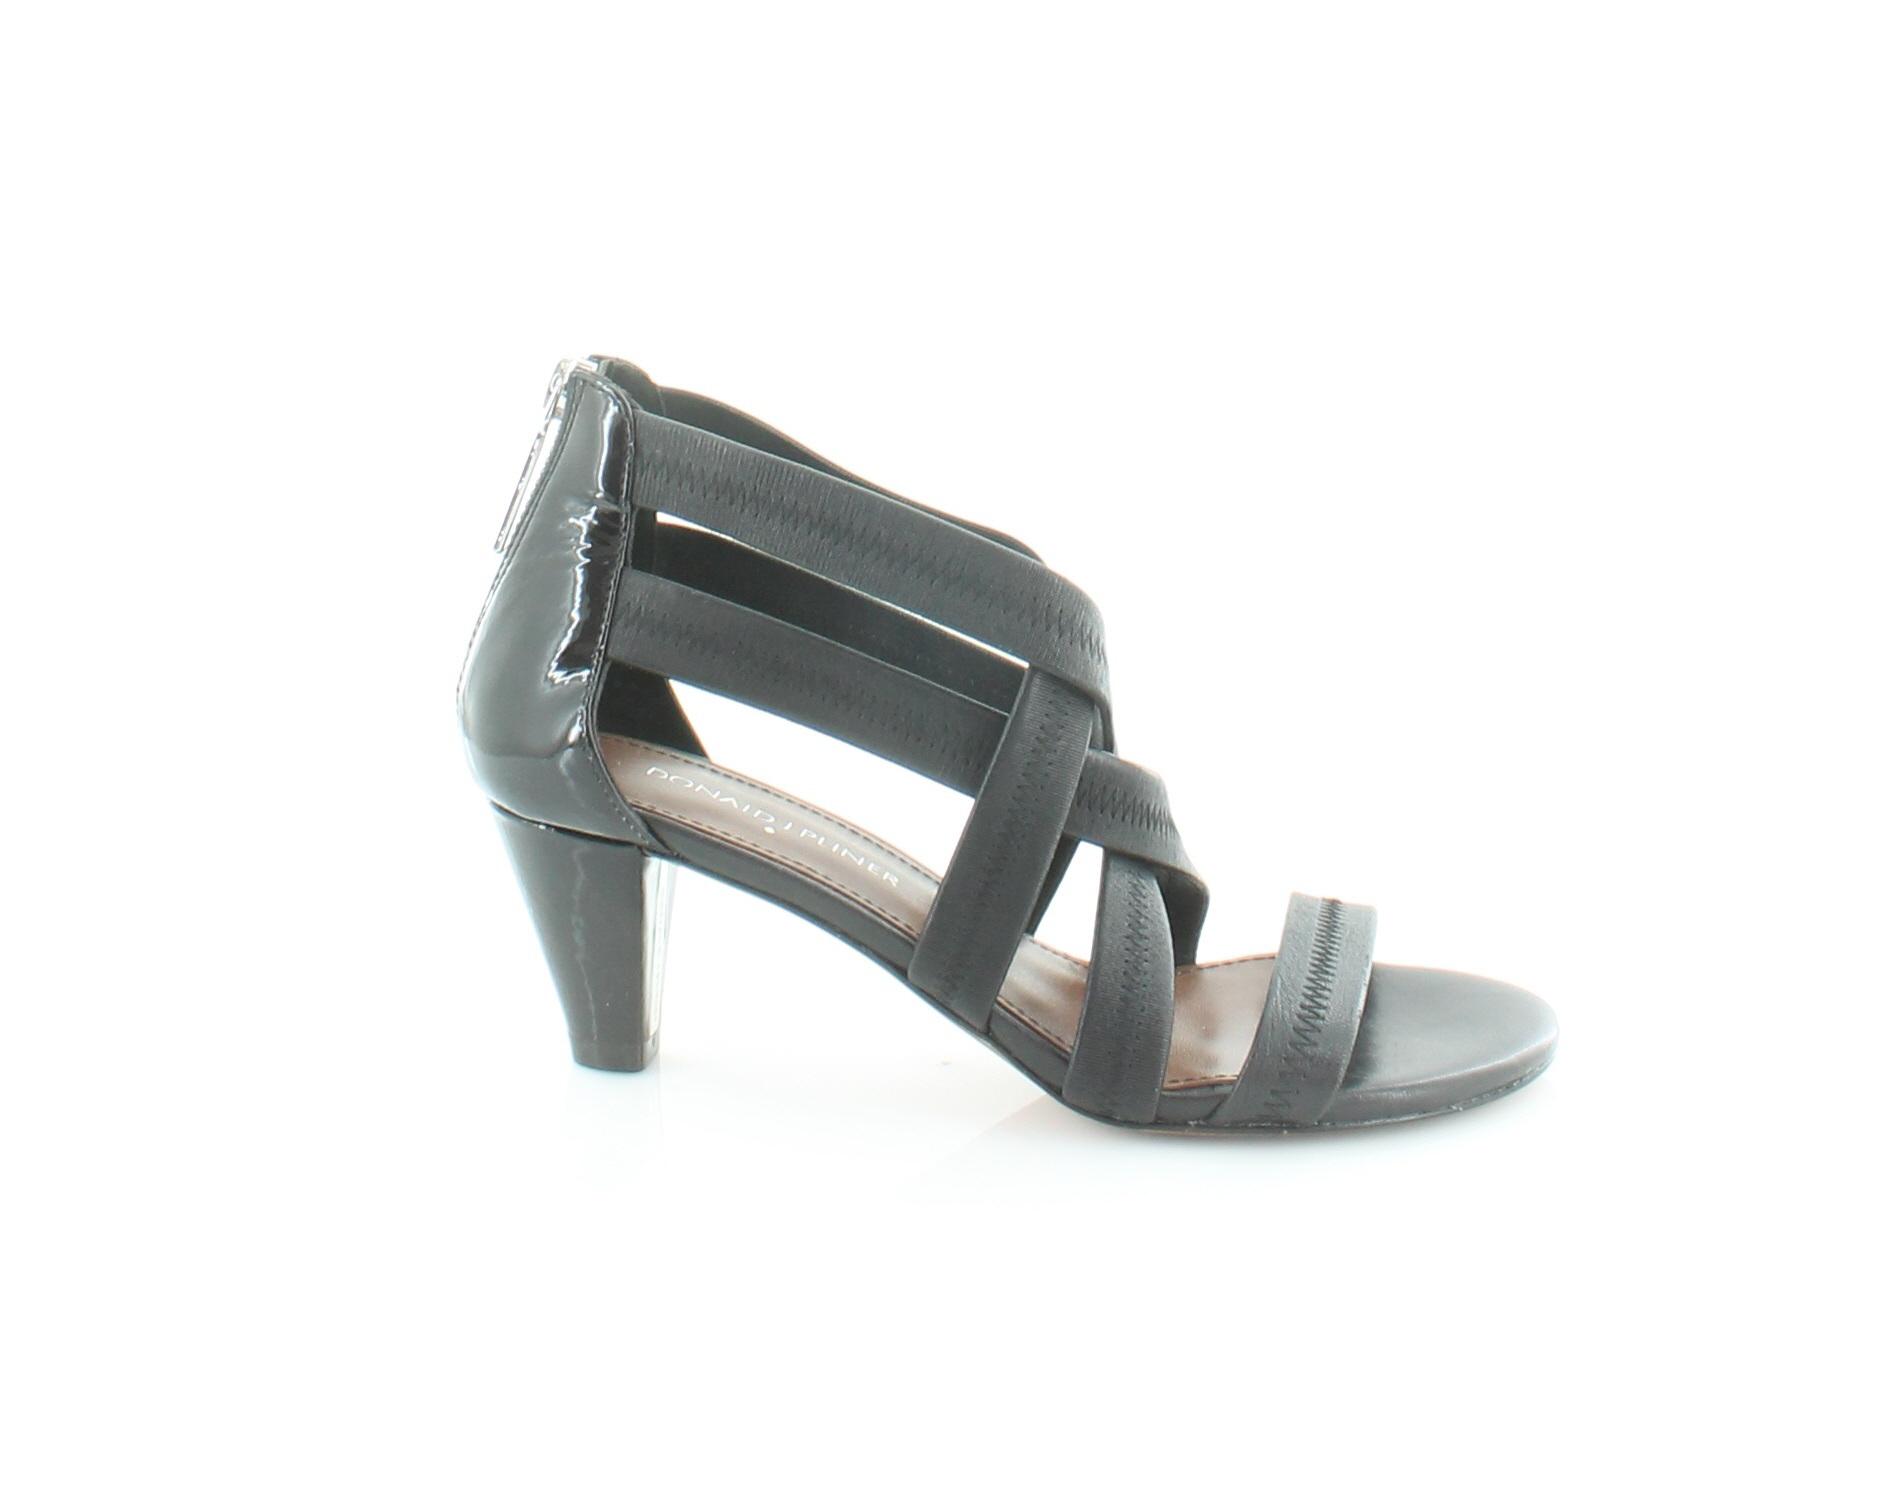 Donald J Pliner Vida Black Womens Shoes Size 6 M M 6 Heels MSRP $228 2d1226